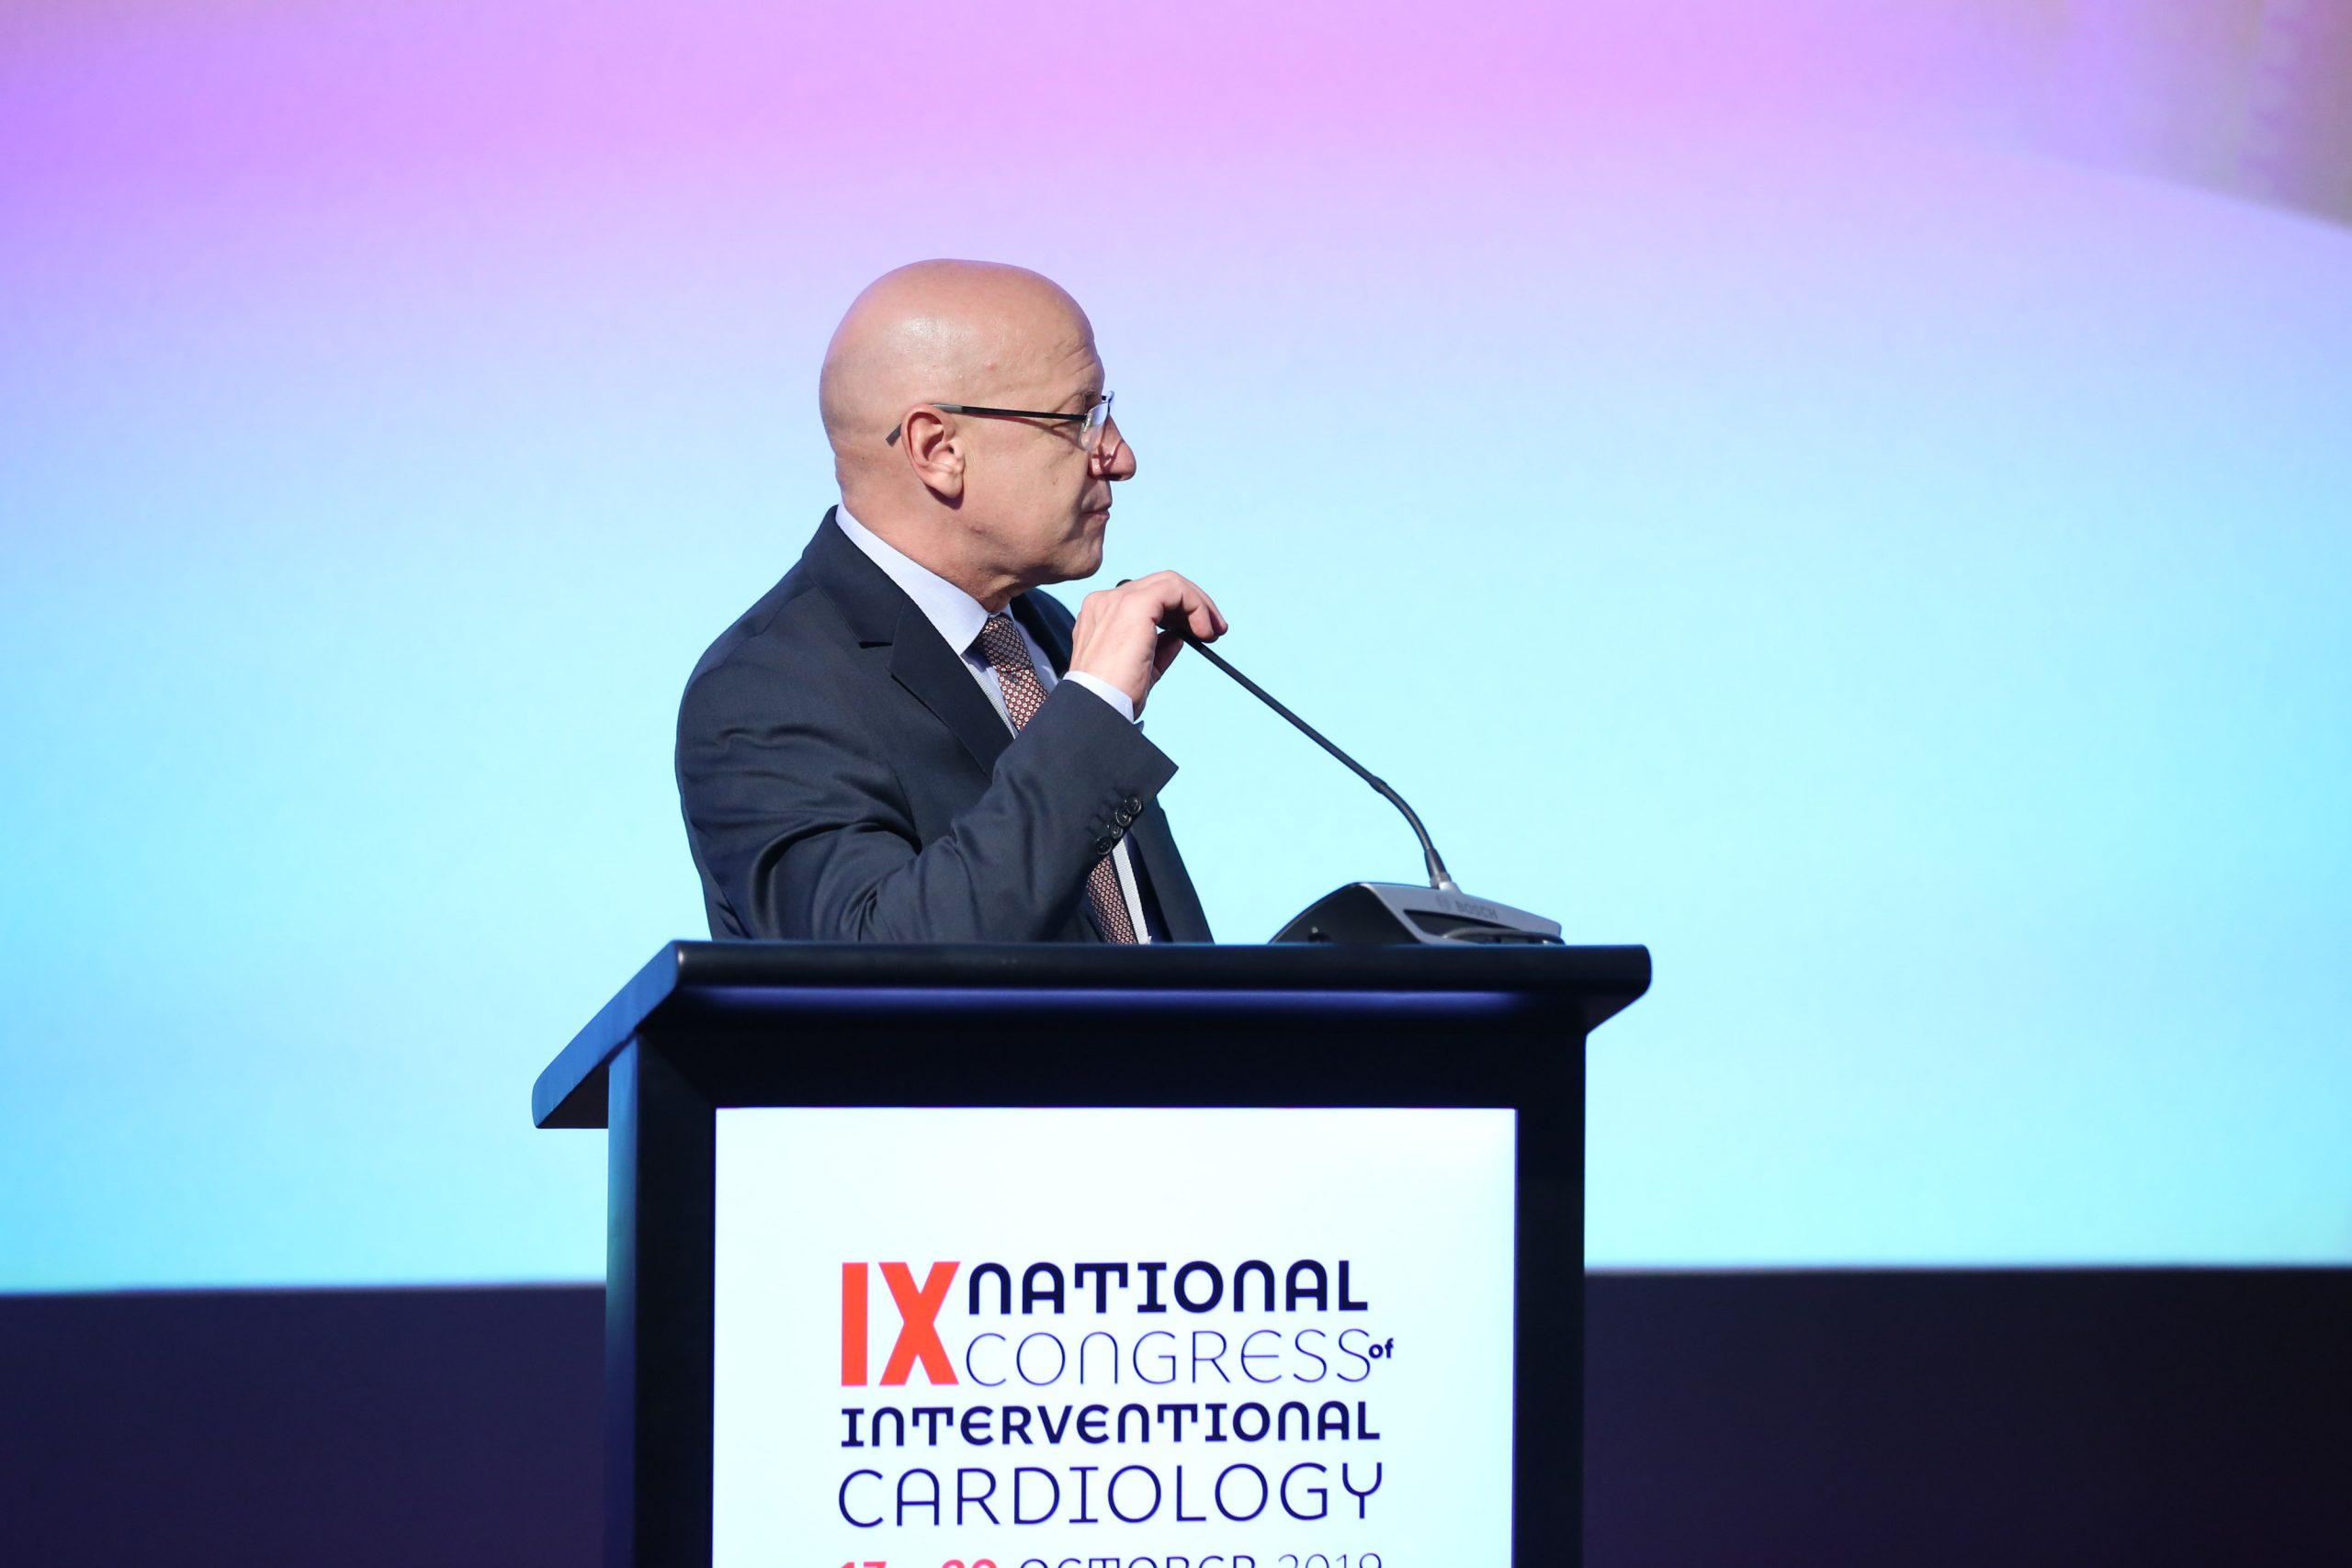 Intervencionalen kongress 2019_26